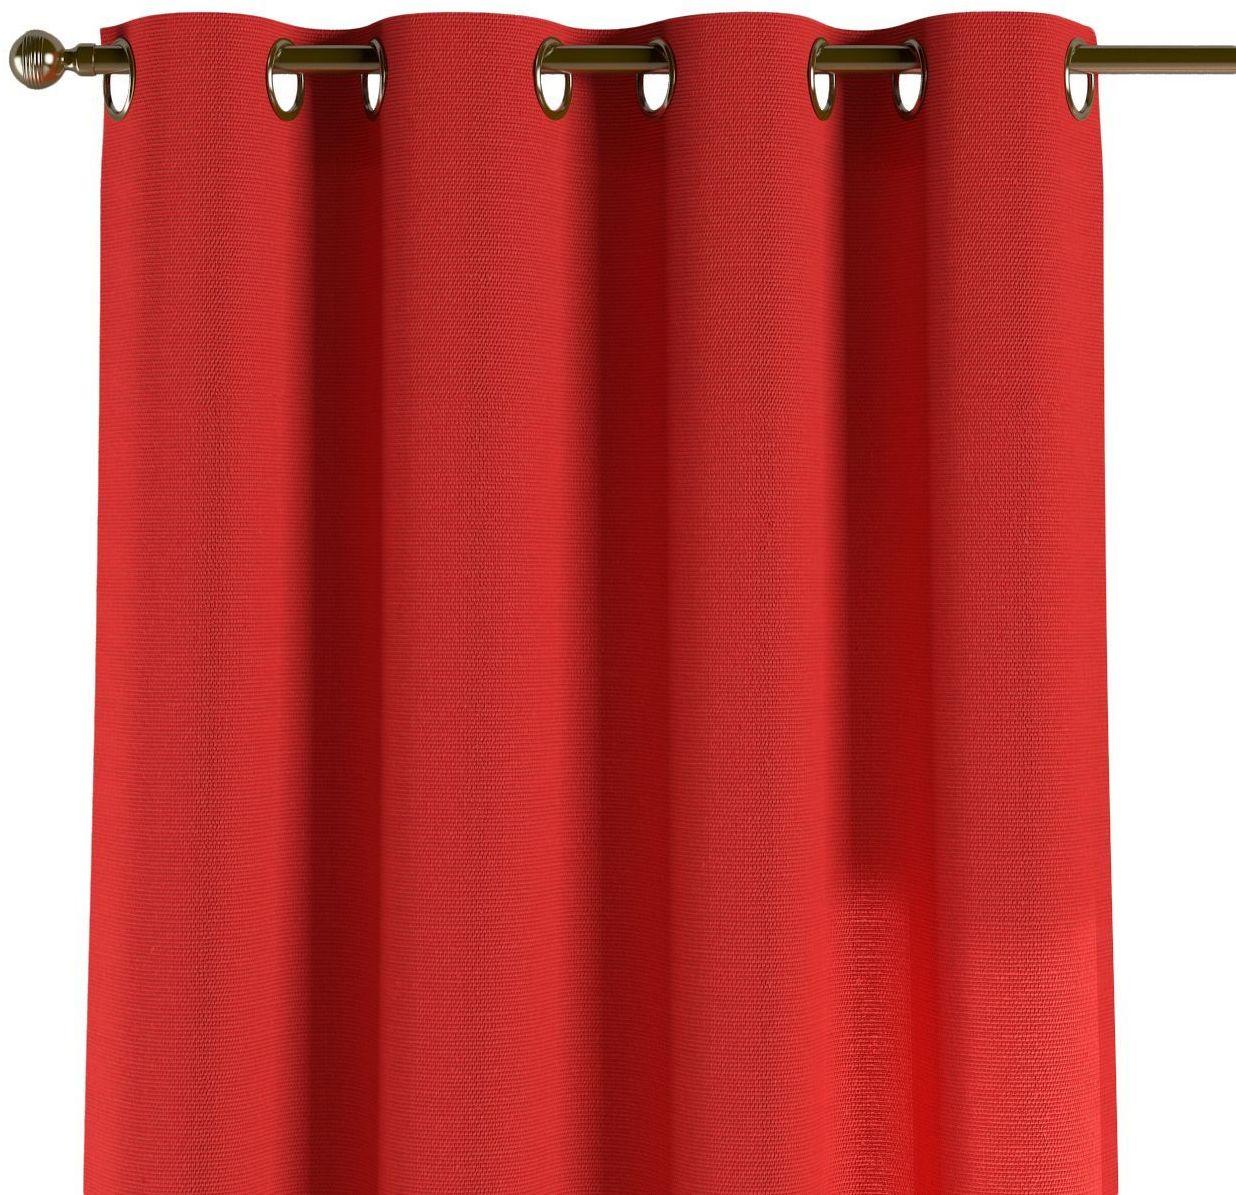 Zasłona na kółkach 1 szt., czerwony, 1szt 130  260 cm, Loneta